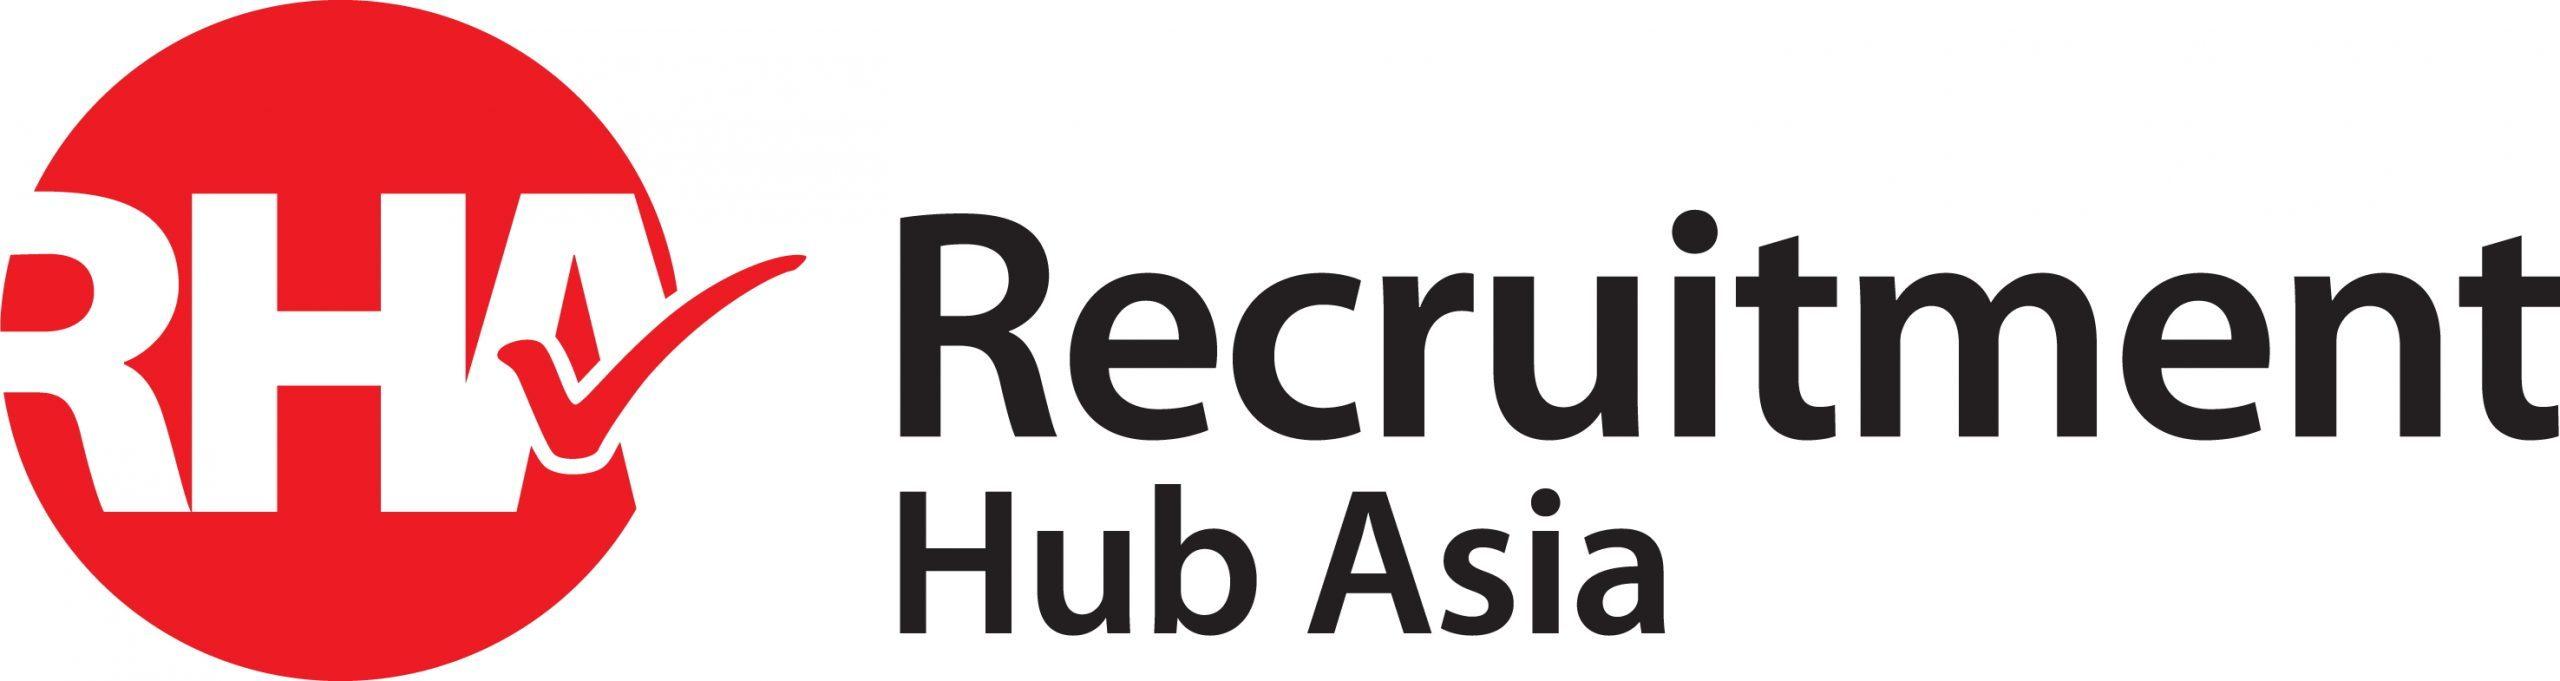 Recruitment Hub Asia